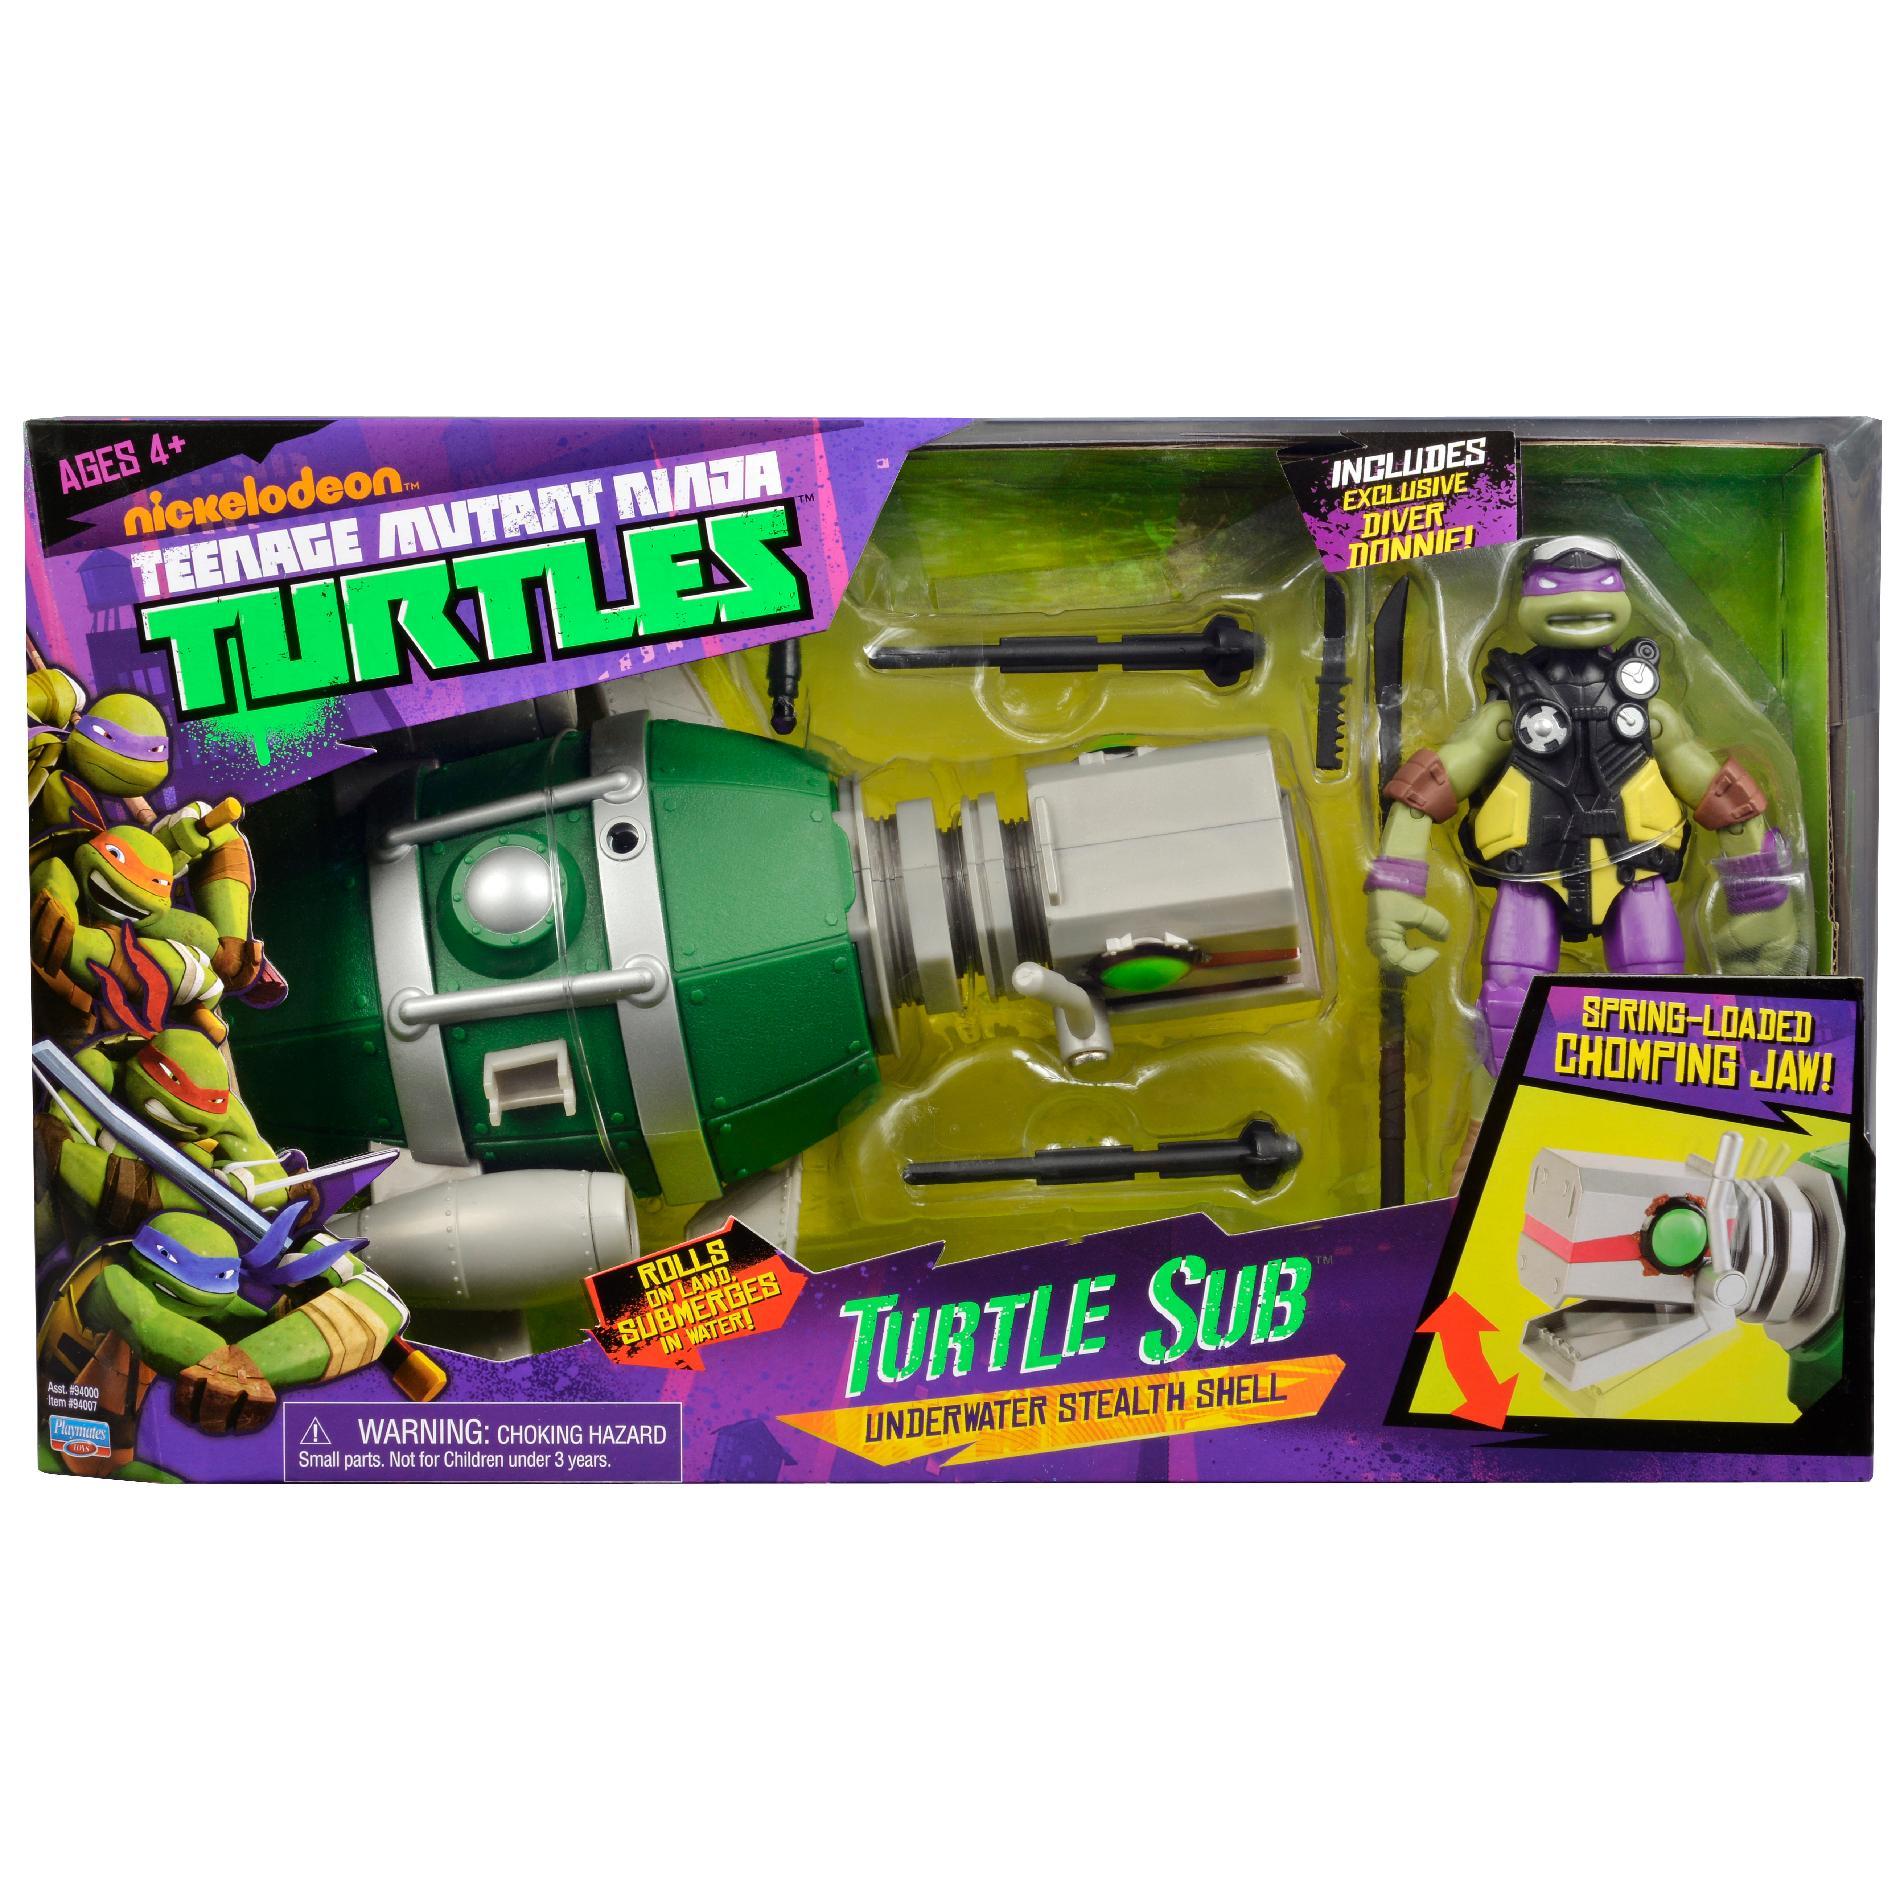 Tmnt Turtles 2014 Toy At Kmart Sub : Category figure vehicle combo toys tmntpedia fandom